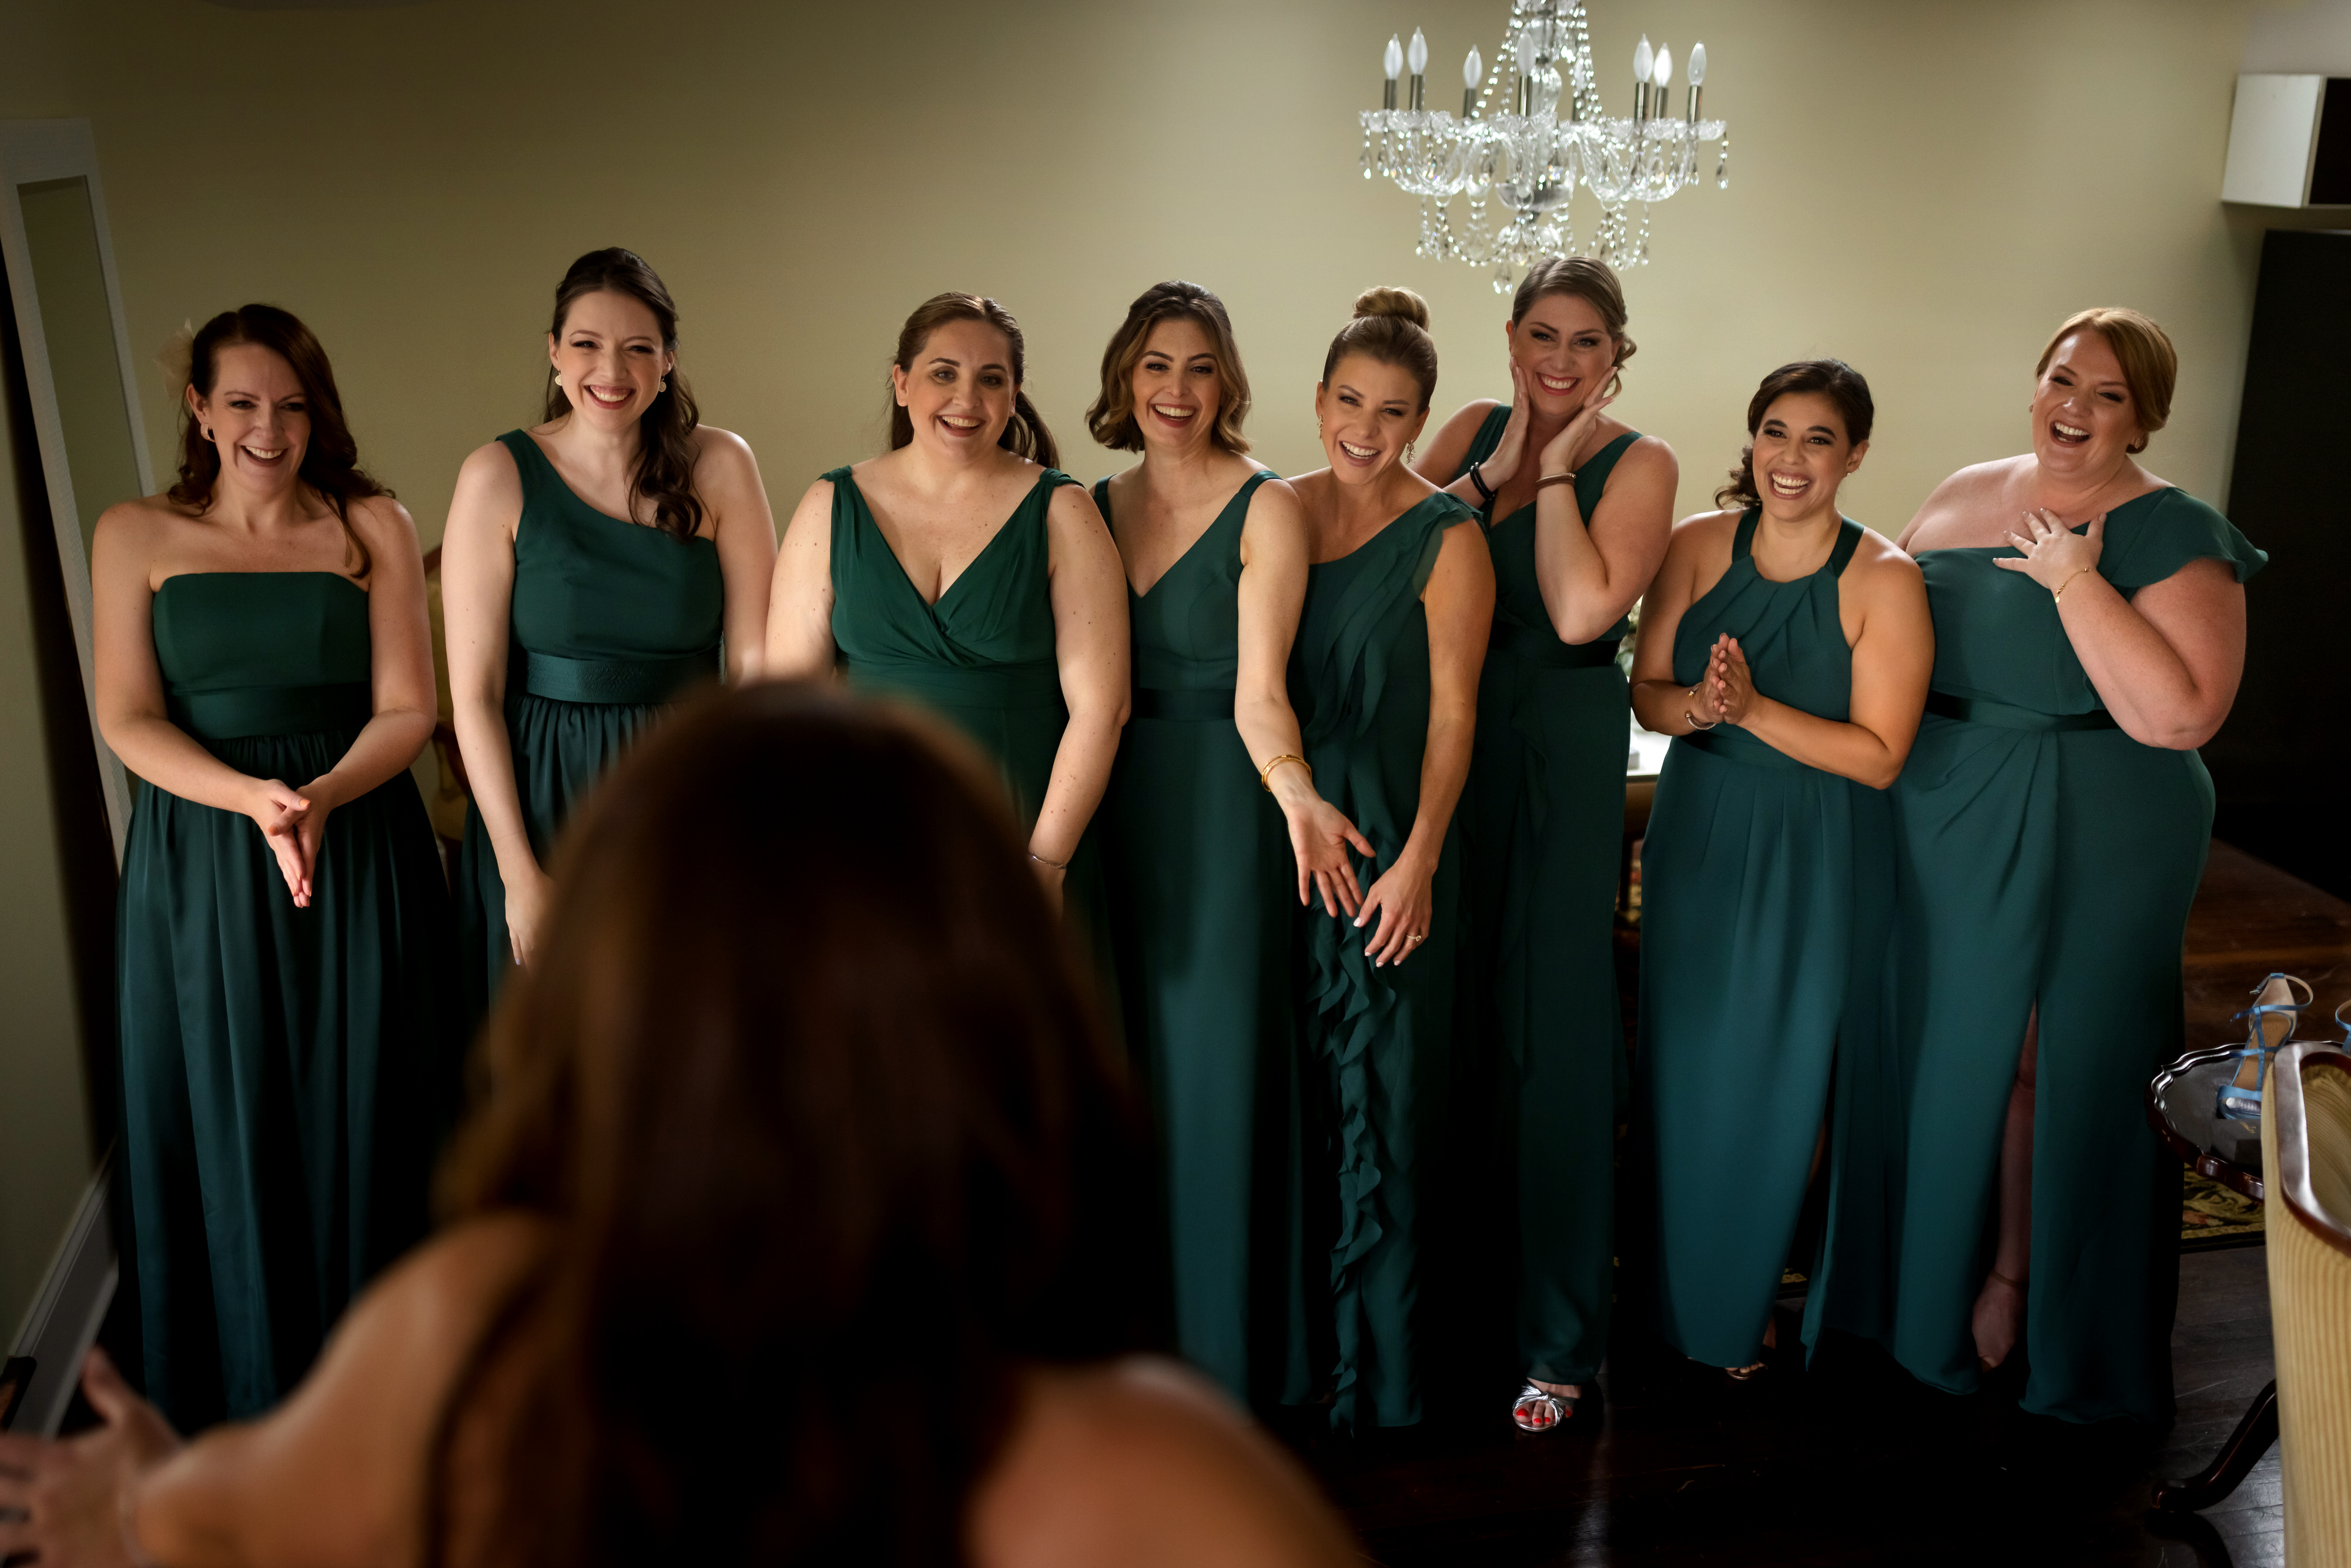 bridesmaids react to seeing bride in wedding dress